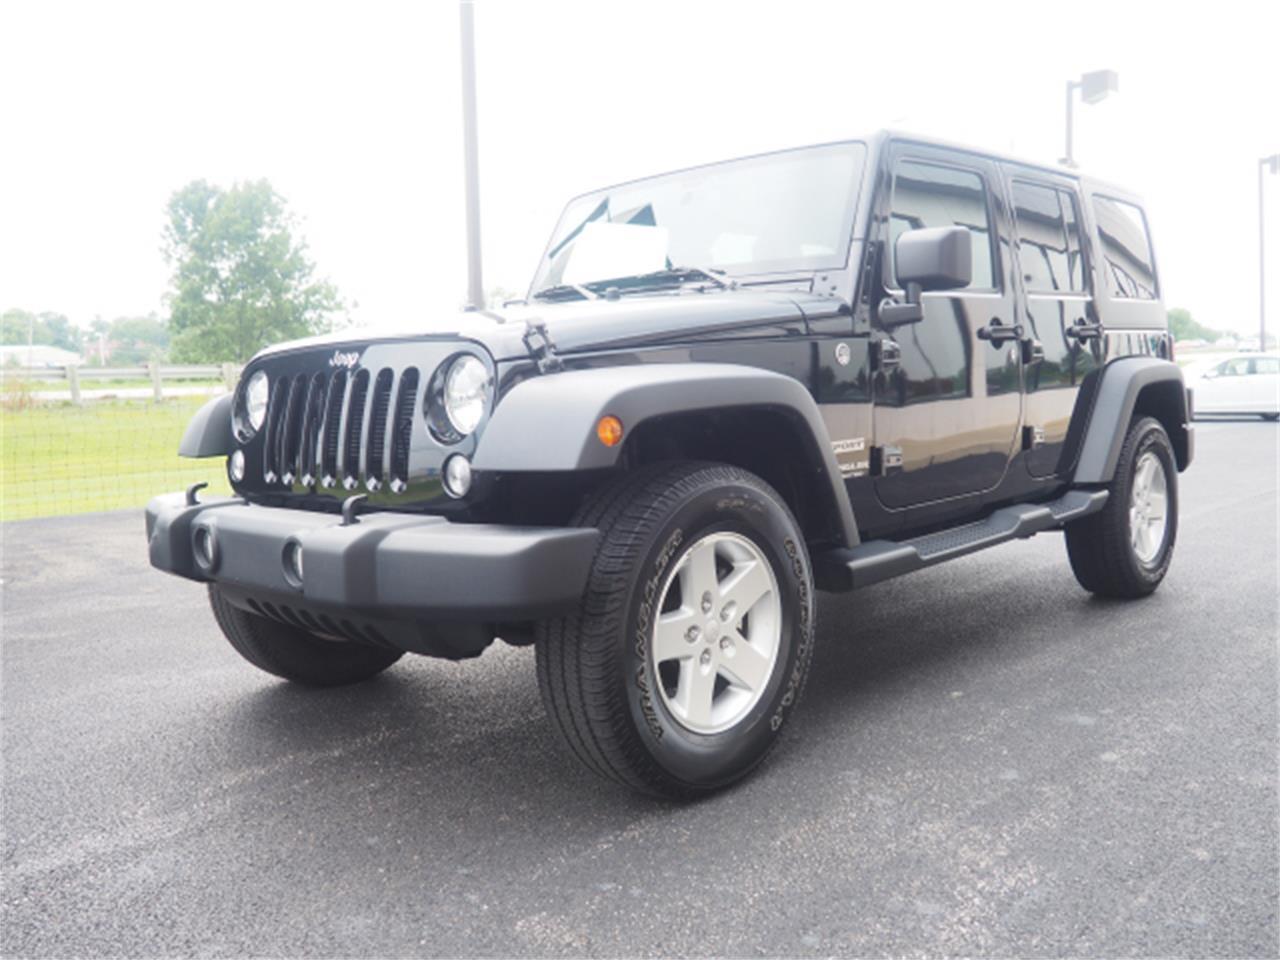 2015 Jeep Wrangler (CC-1199549) for sale in Marysville, Ohio